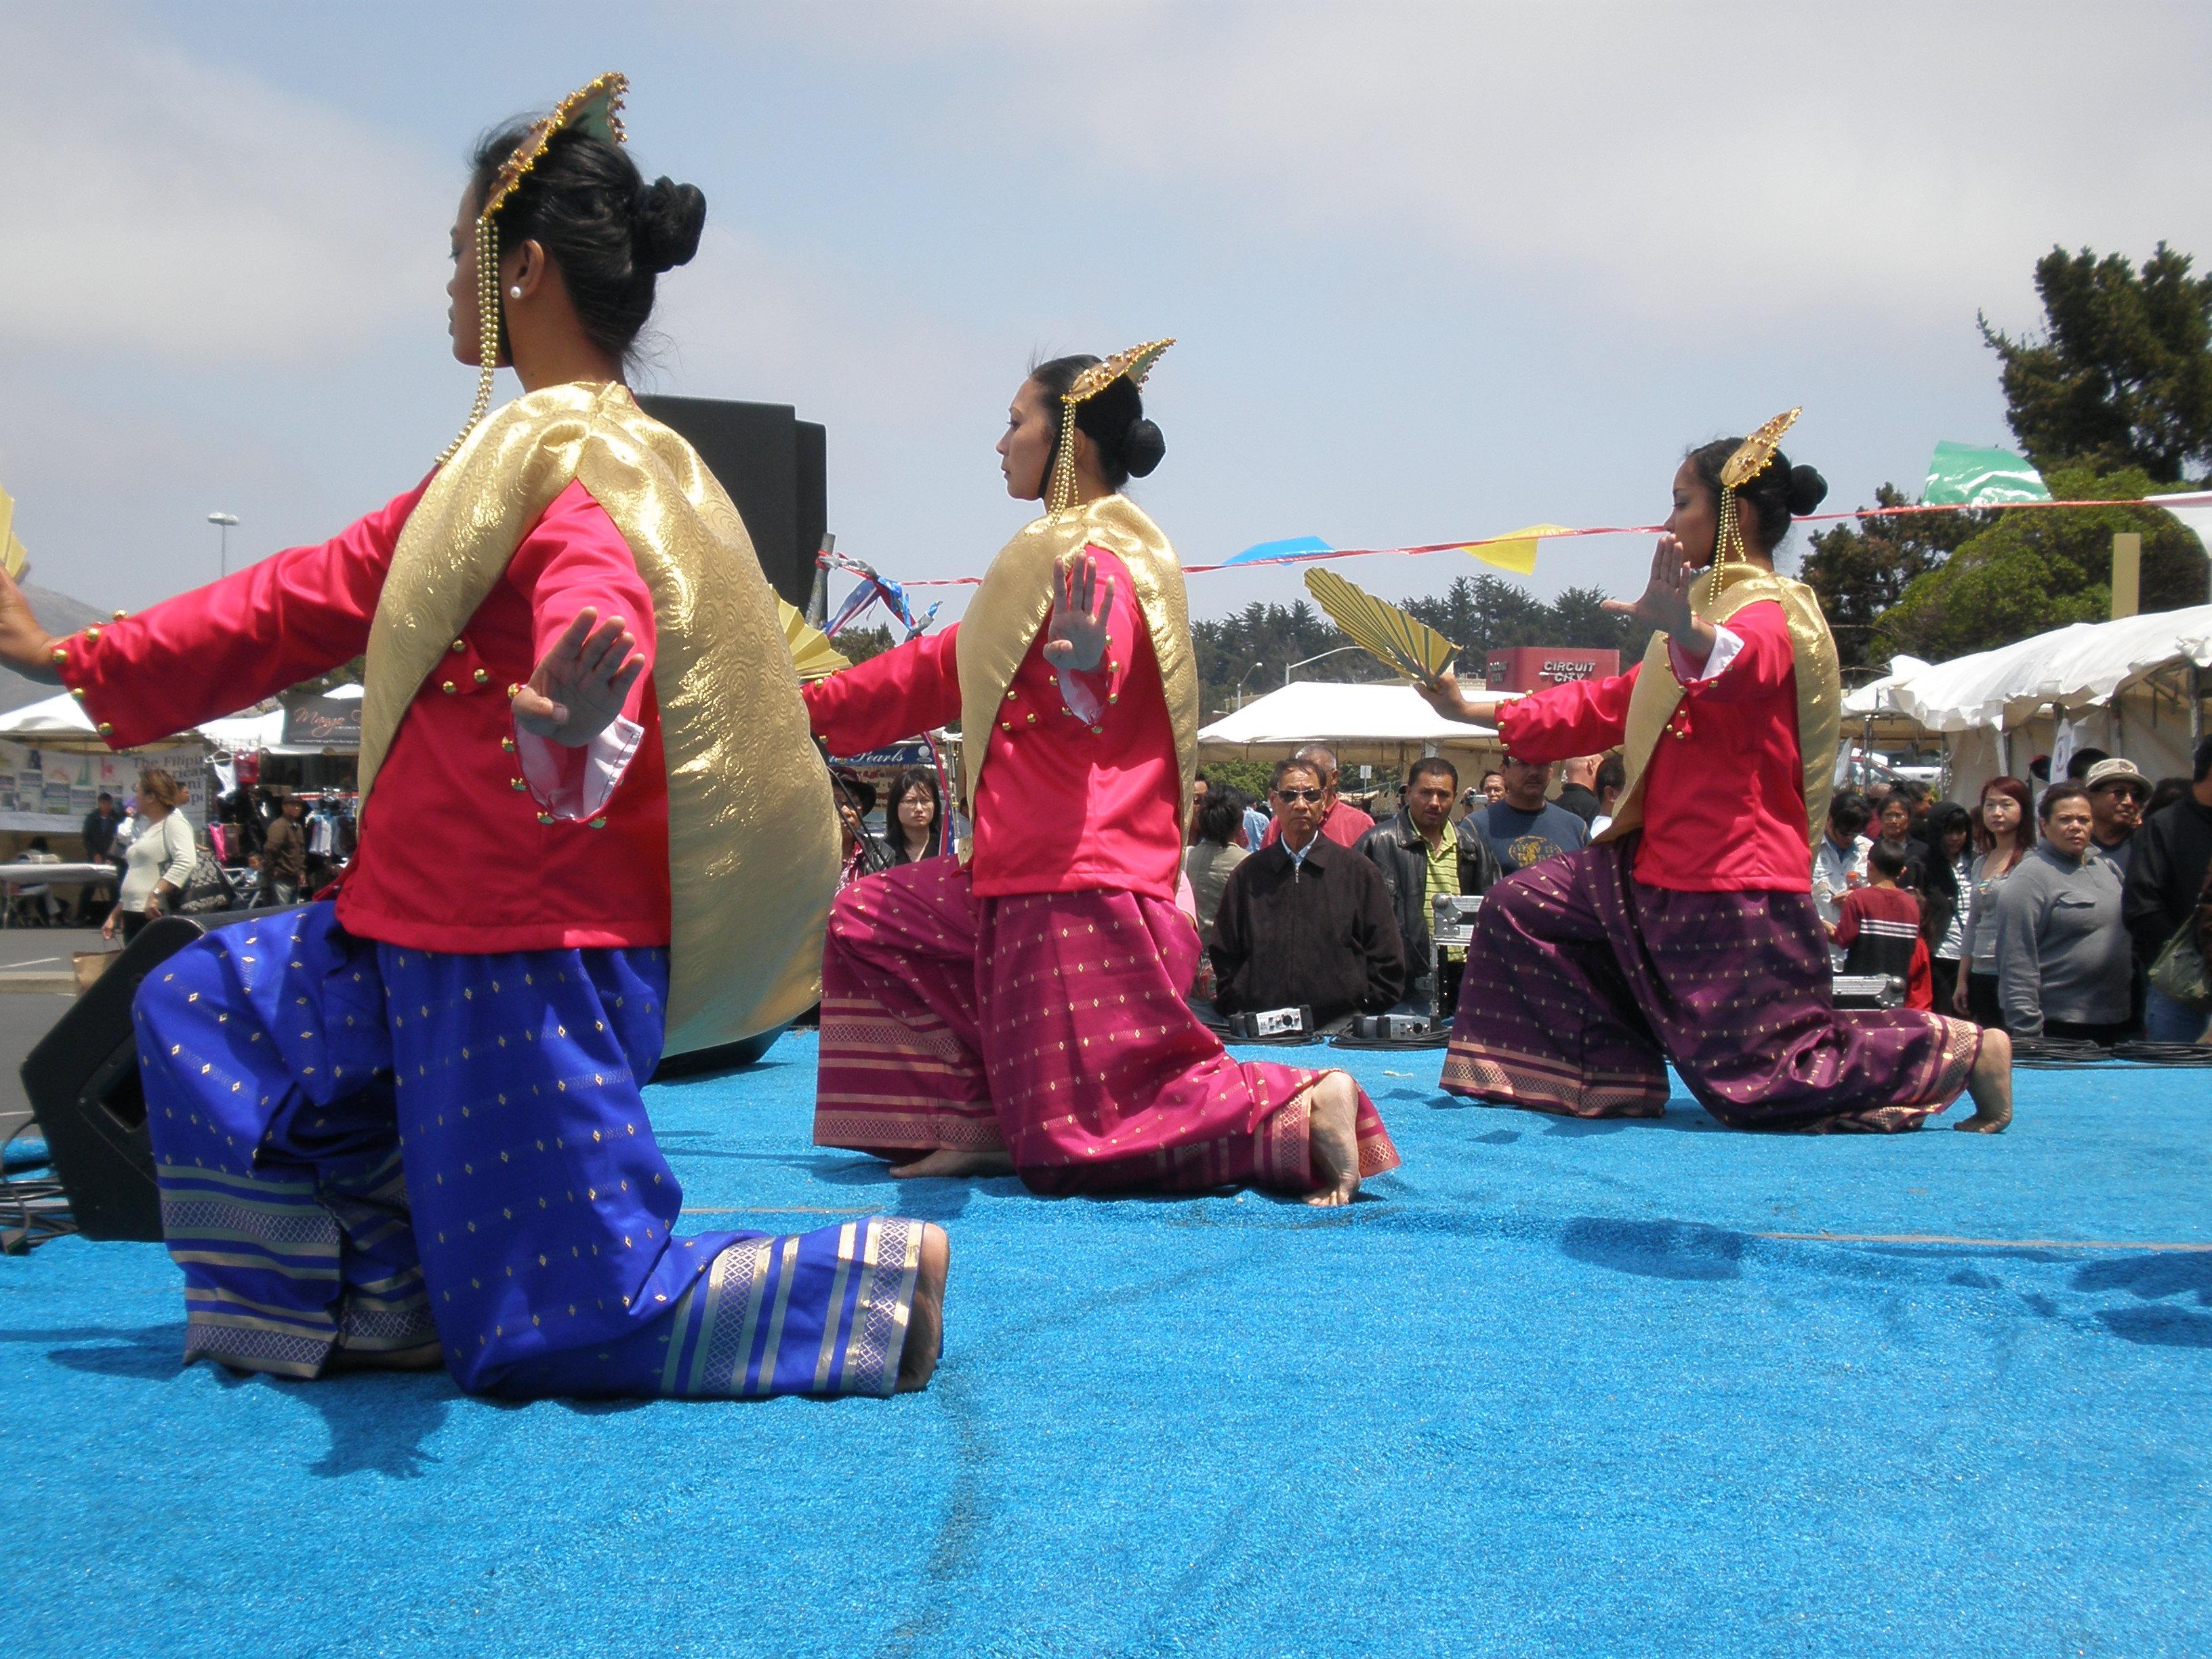 Parangal dance company philippine folk dance - File Parangal Dance Co Performing Daling Daling At 14th Af Afc 4